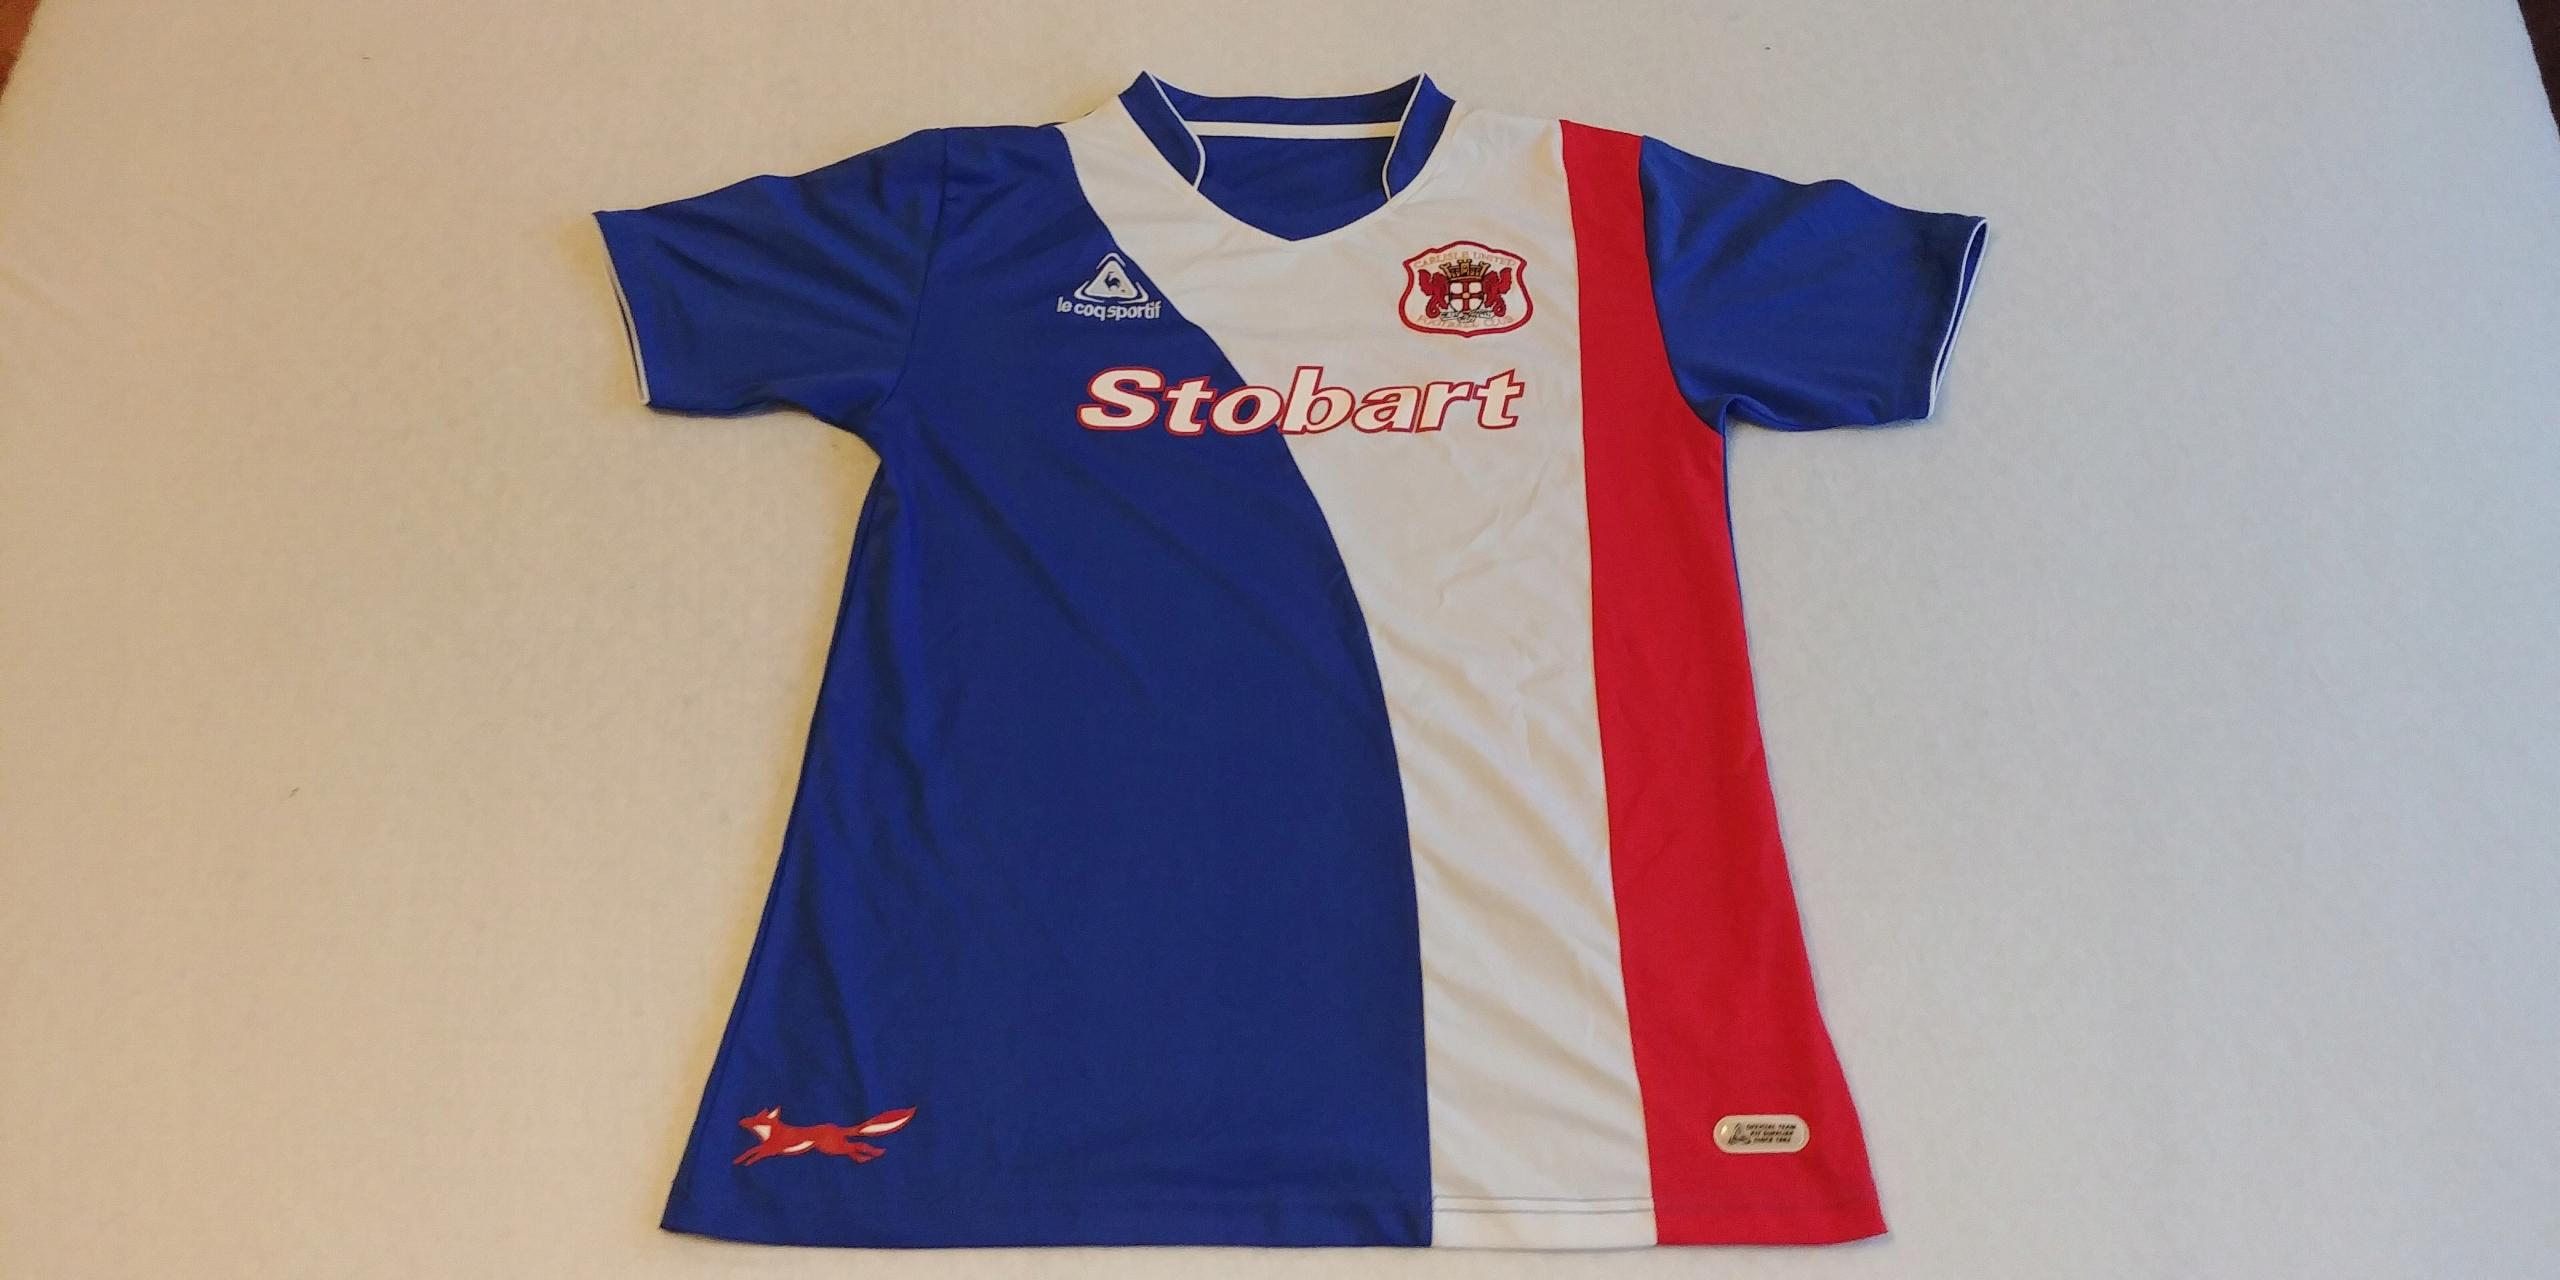 Koszulka Carlisle United 2007/2009 Le Coq Sportif